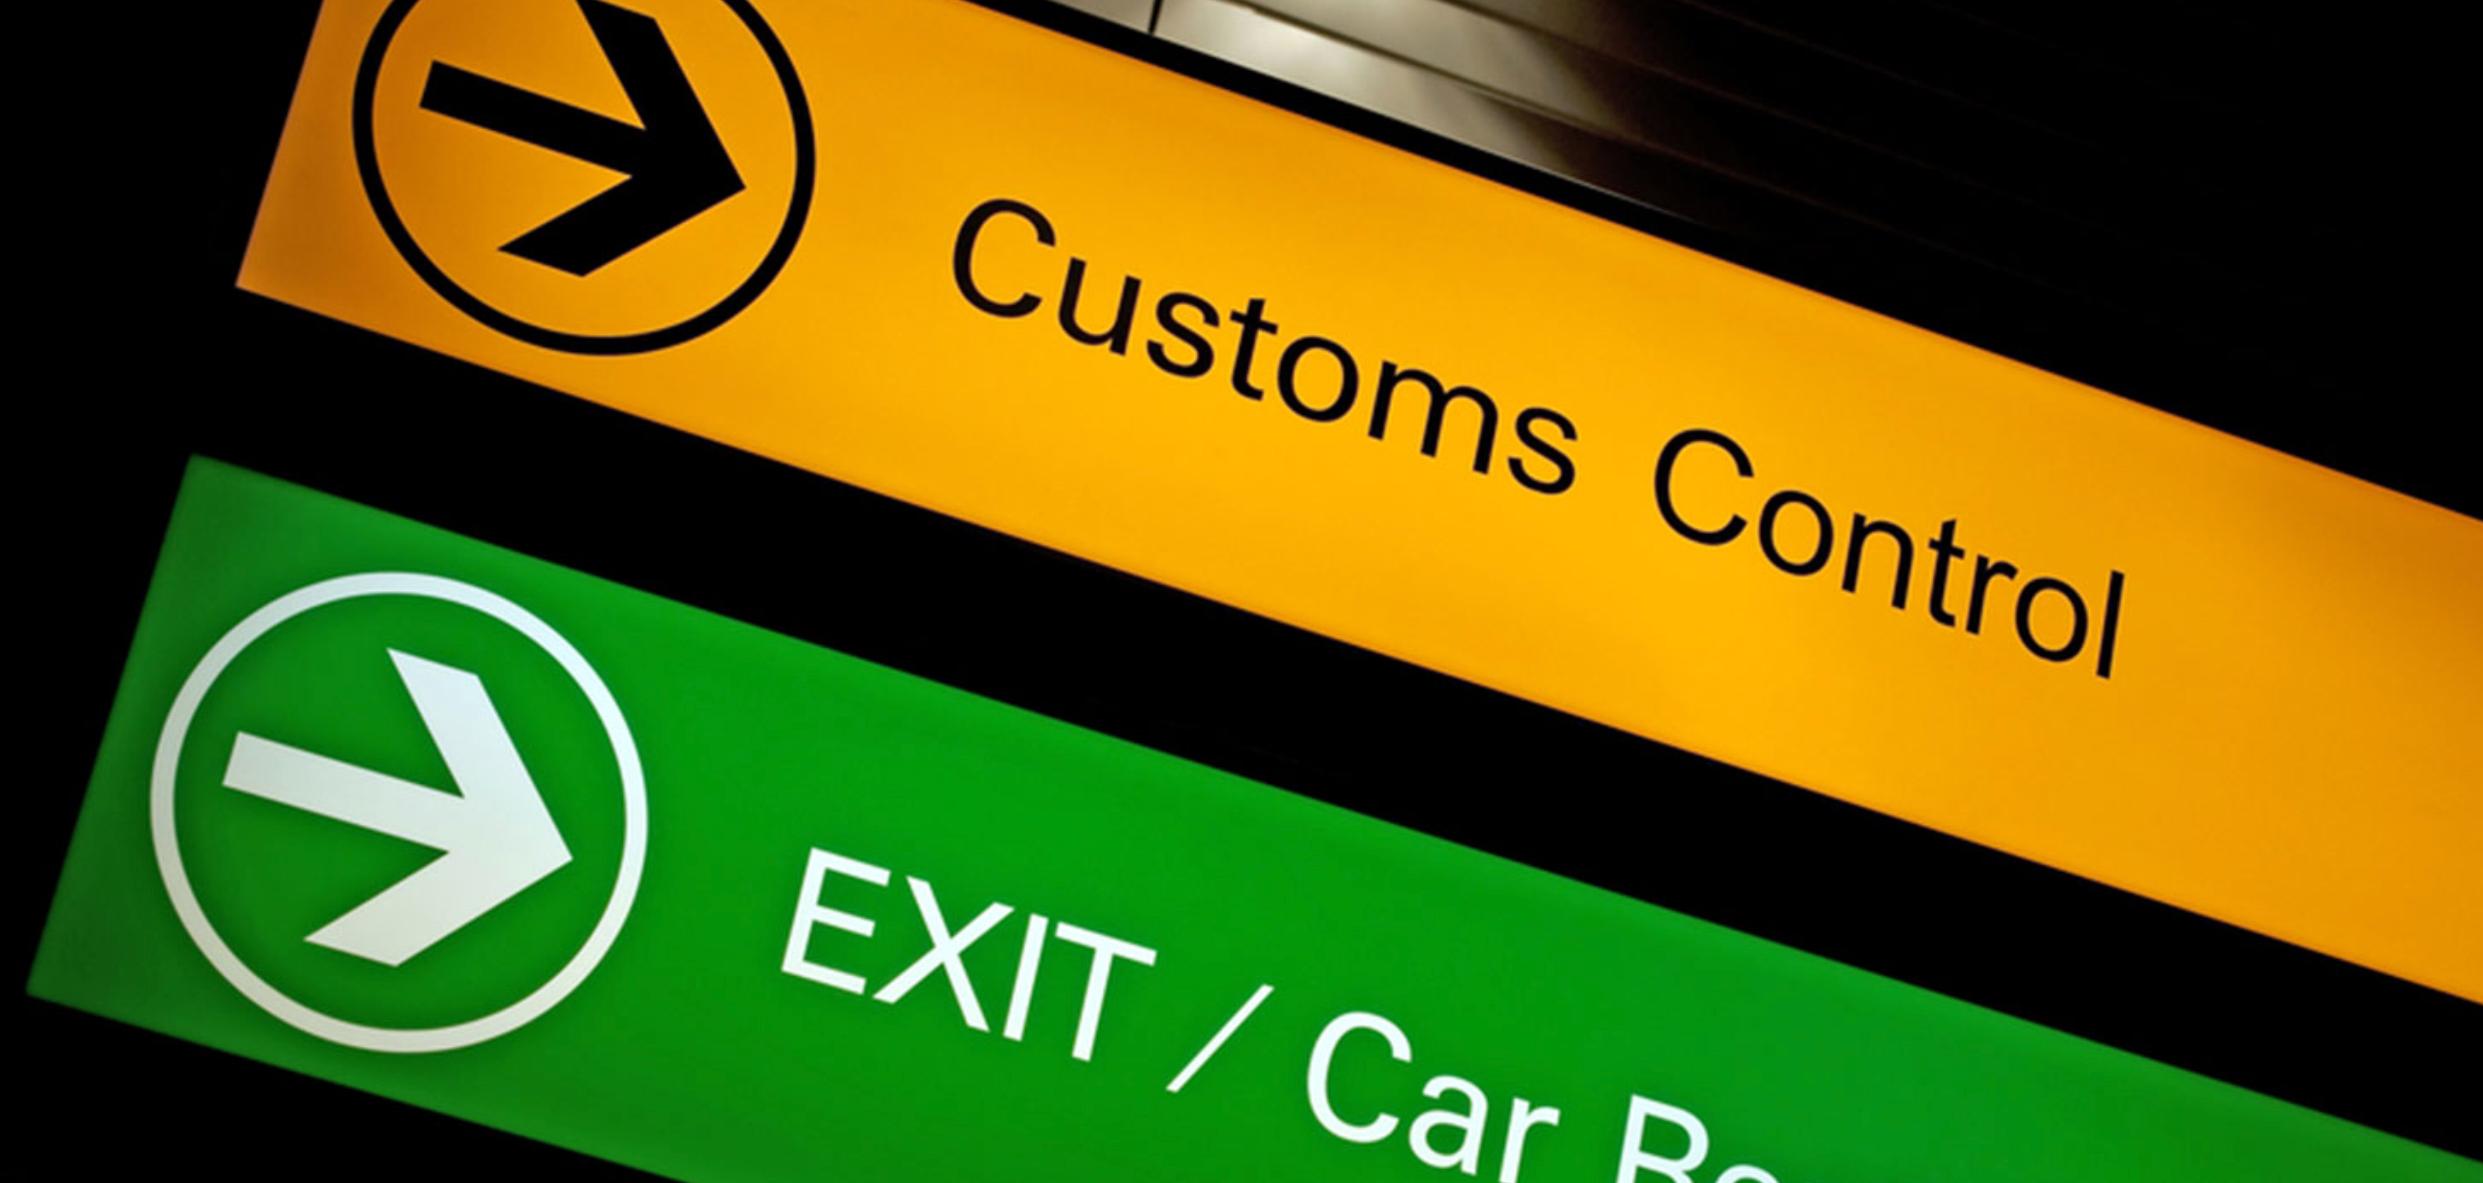 Complete customs fudge up